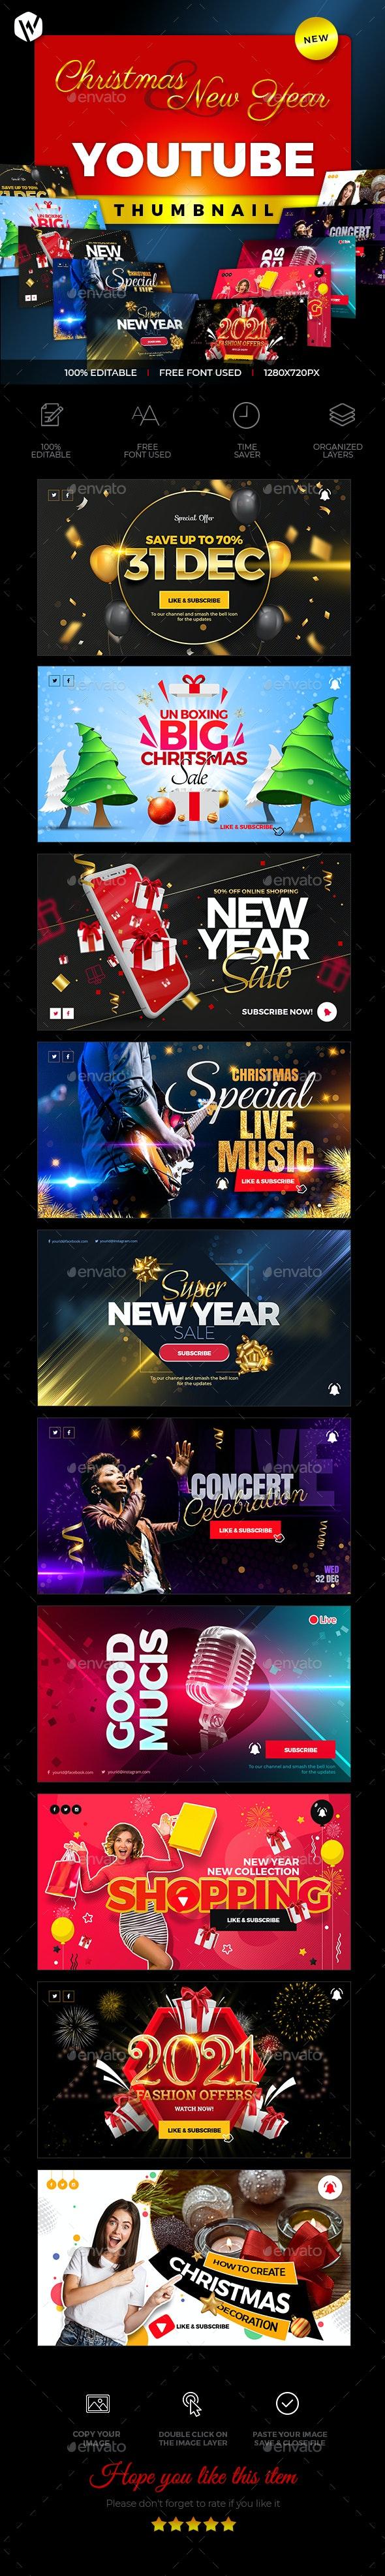 Youtube Thumbnail - Christmas & New year - Social Media Web Elements